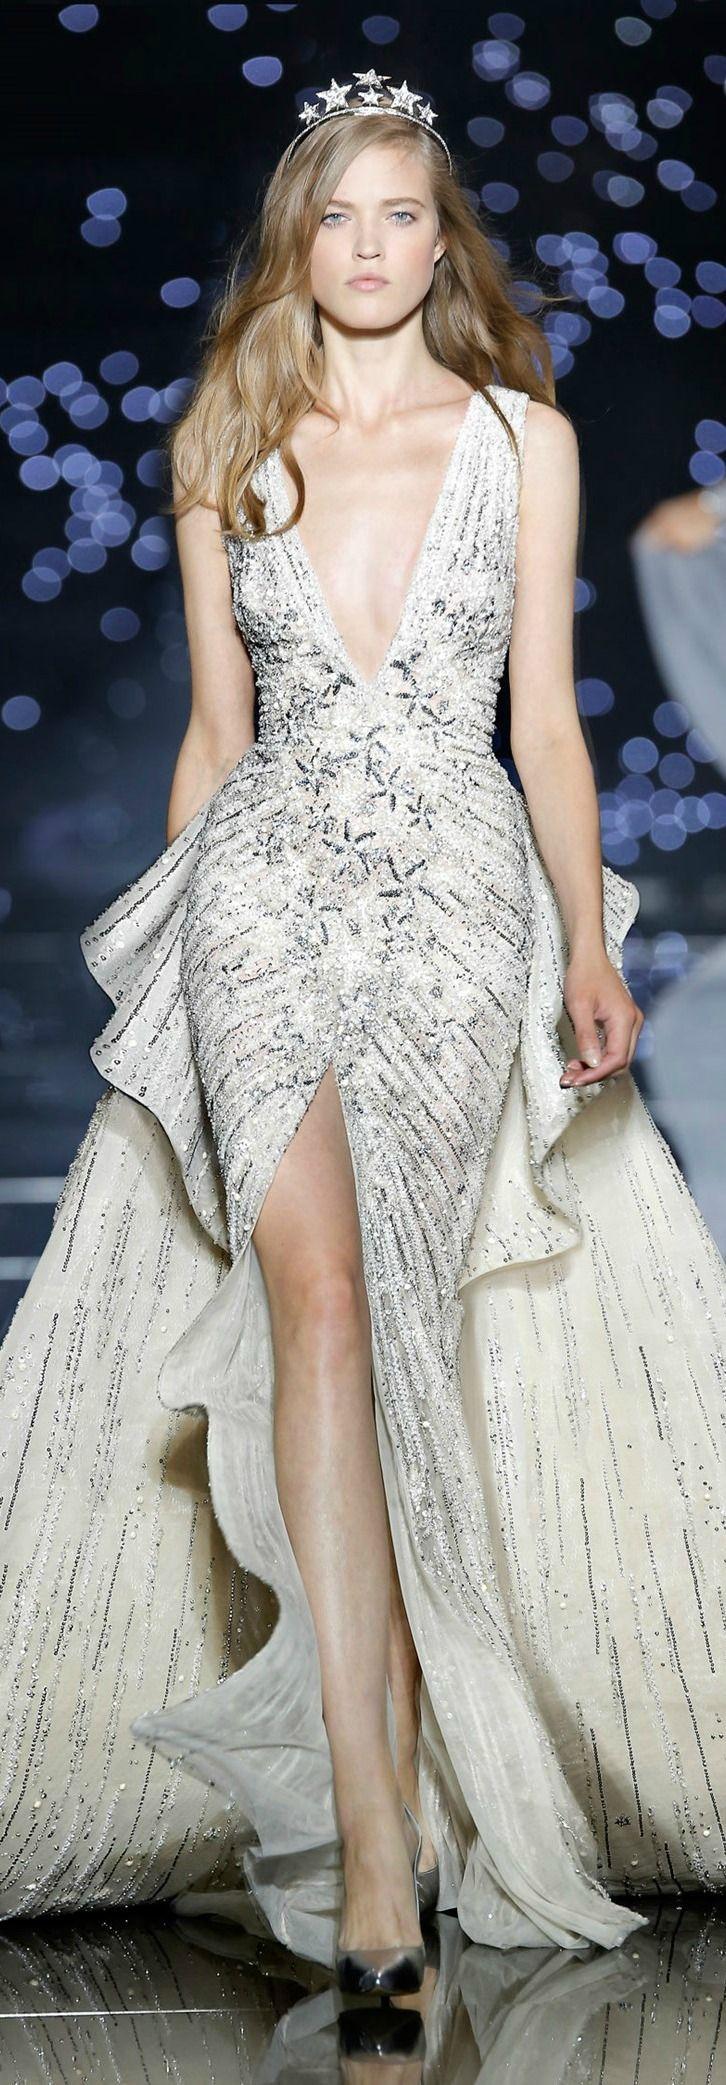 best zuhair murad images on pinterest high fashion formal prom